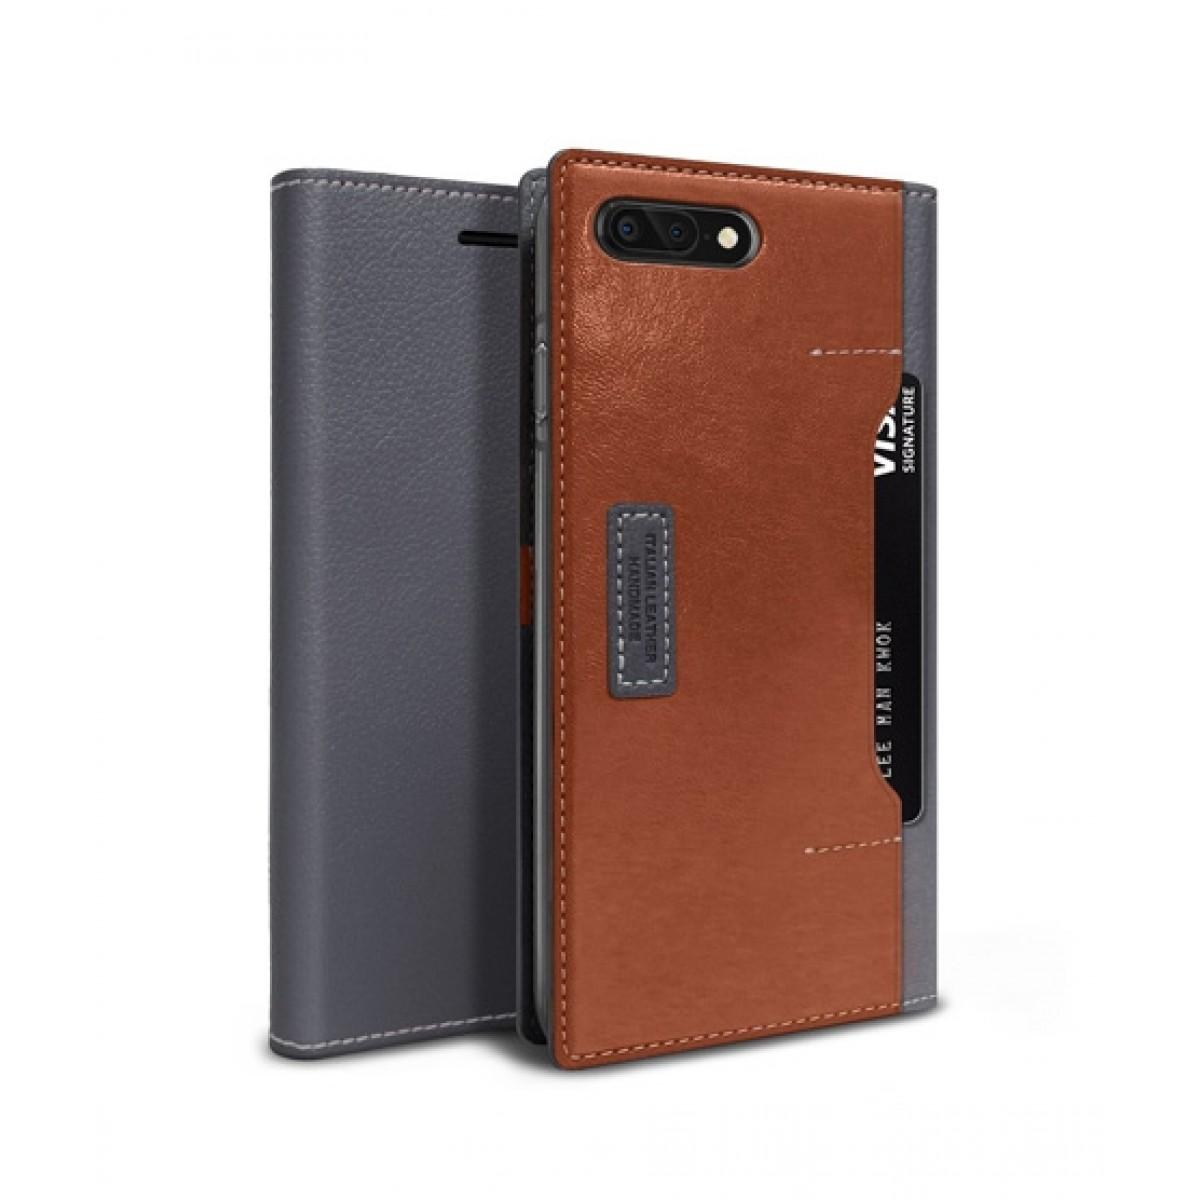 timeless design e1e07 7a96b Obliq K3 Wallet Black Gray Brown Case For iPhone 8 Plus